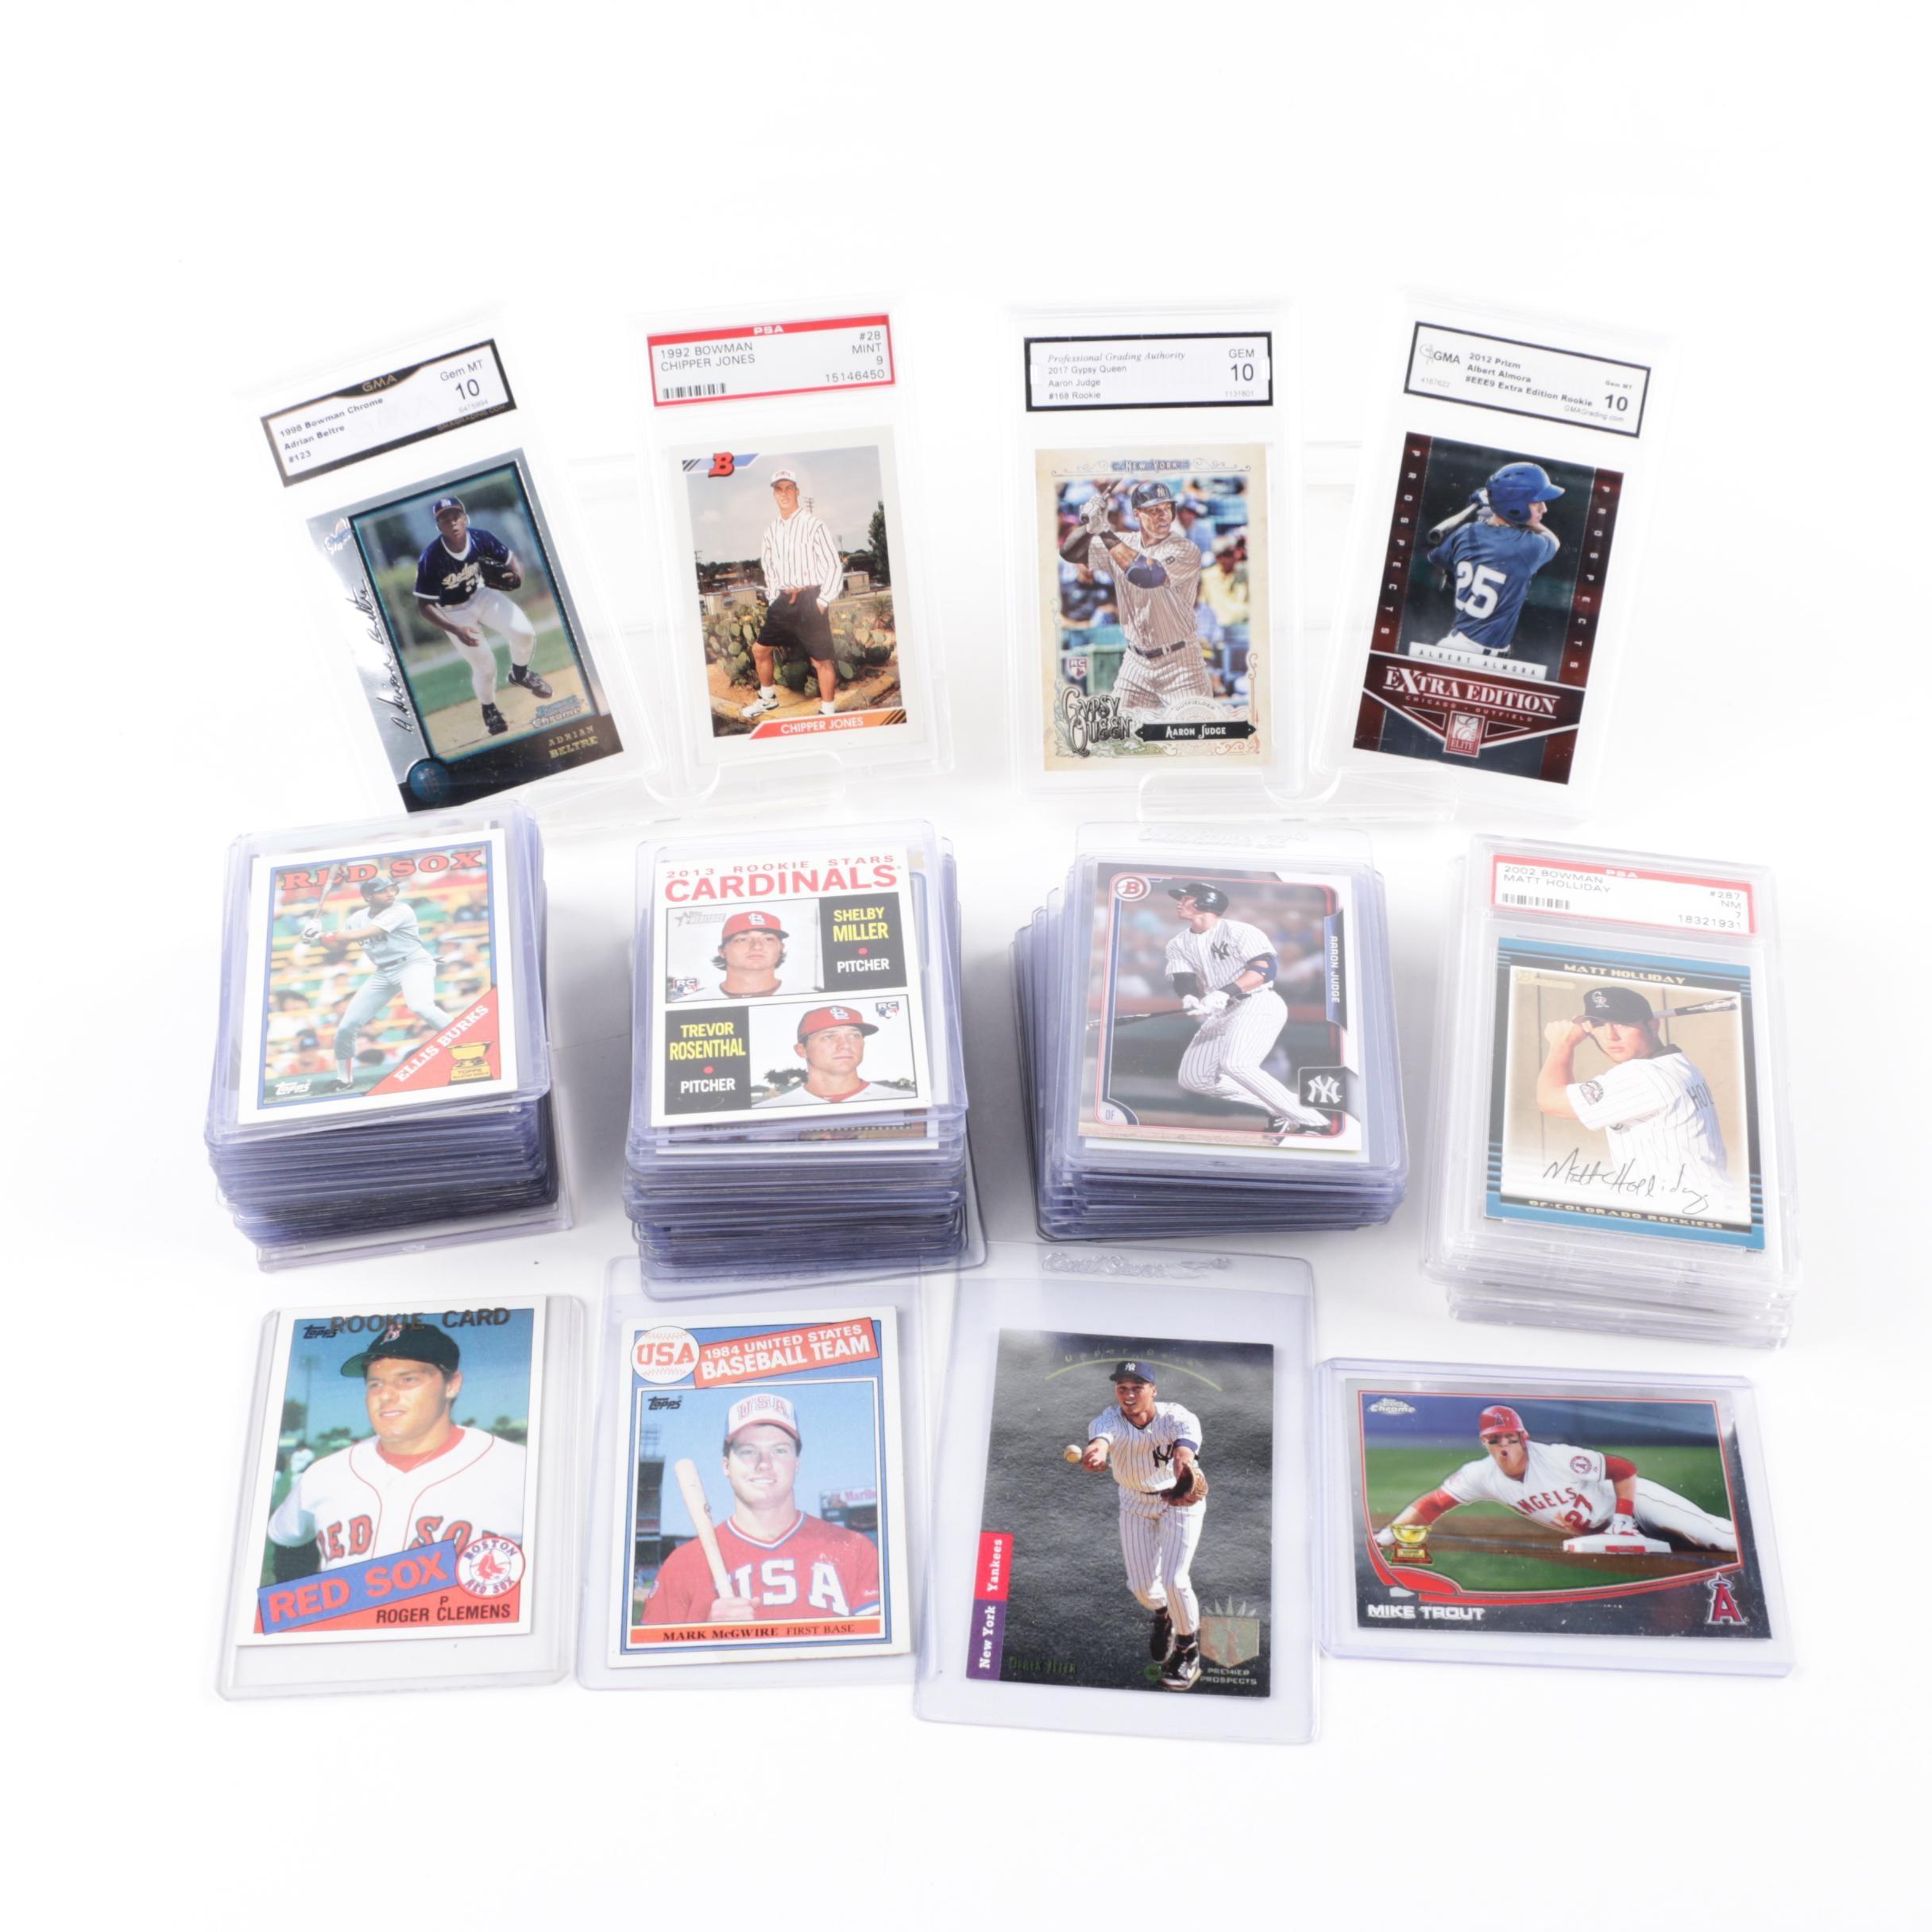 1980s to Present Baseball Cards with Derek Jeter 1993 Upper Deck SP Foil Rookie